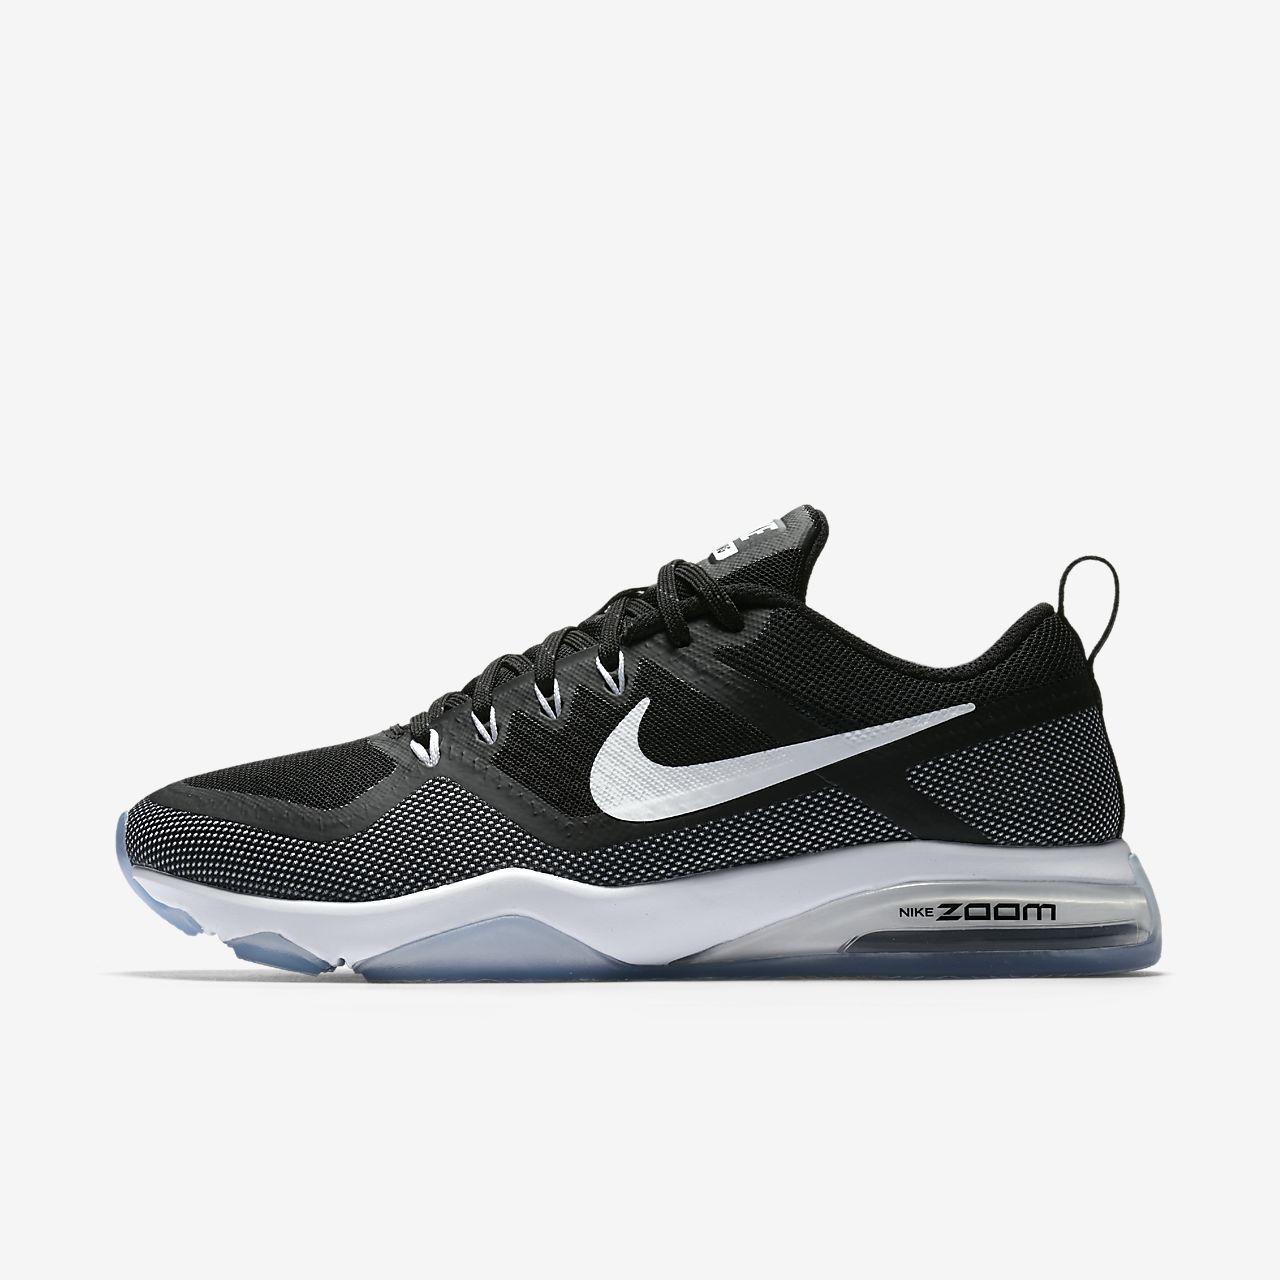 ddc2a9aa1d19 Nike Zoom Fitness Women s Training Shoe. Nike.com SE